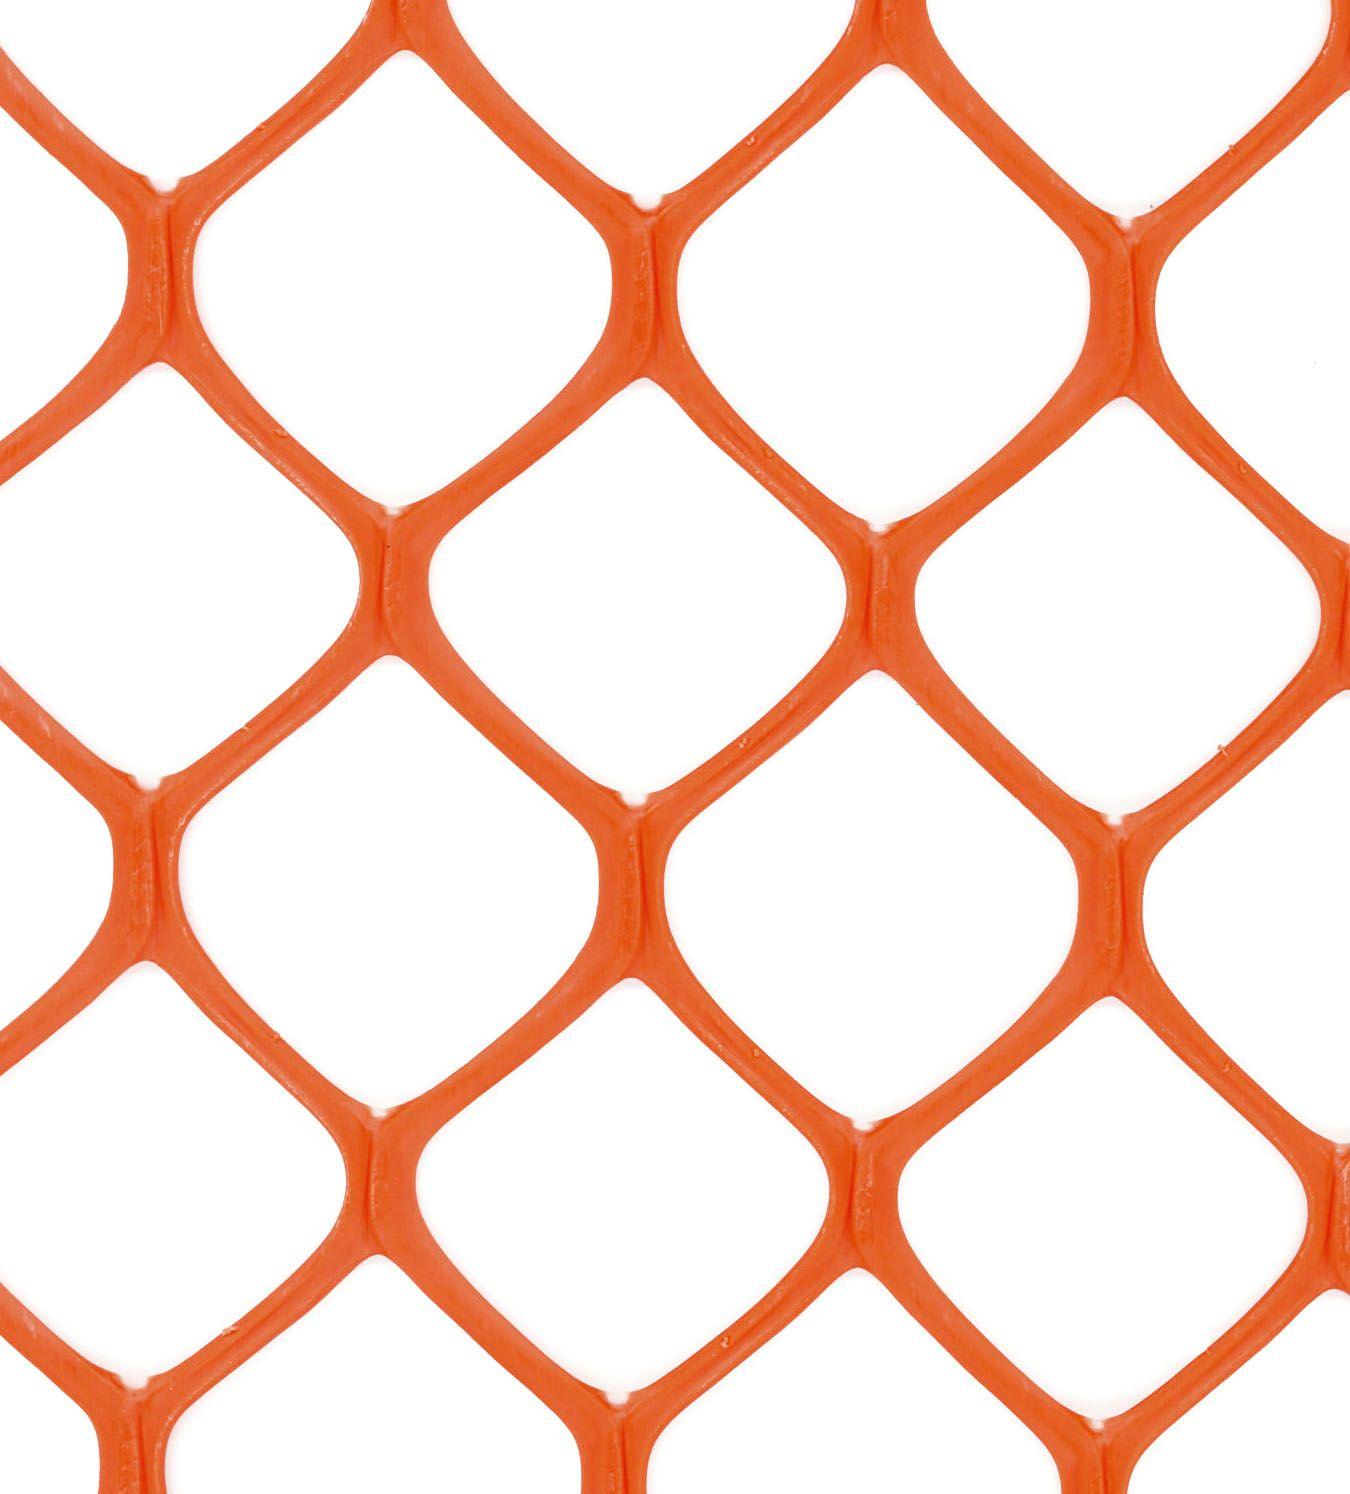 Safety Fence Safety fence, Fence, Safety